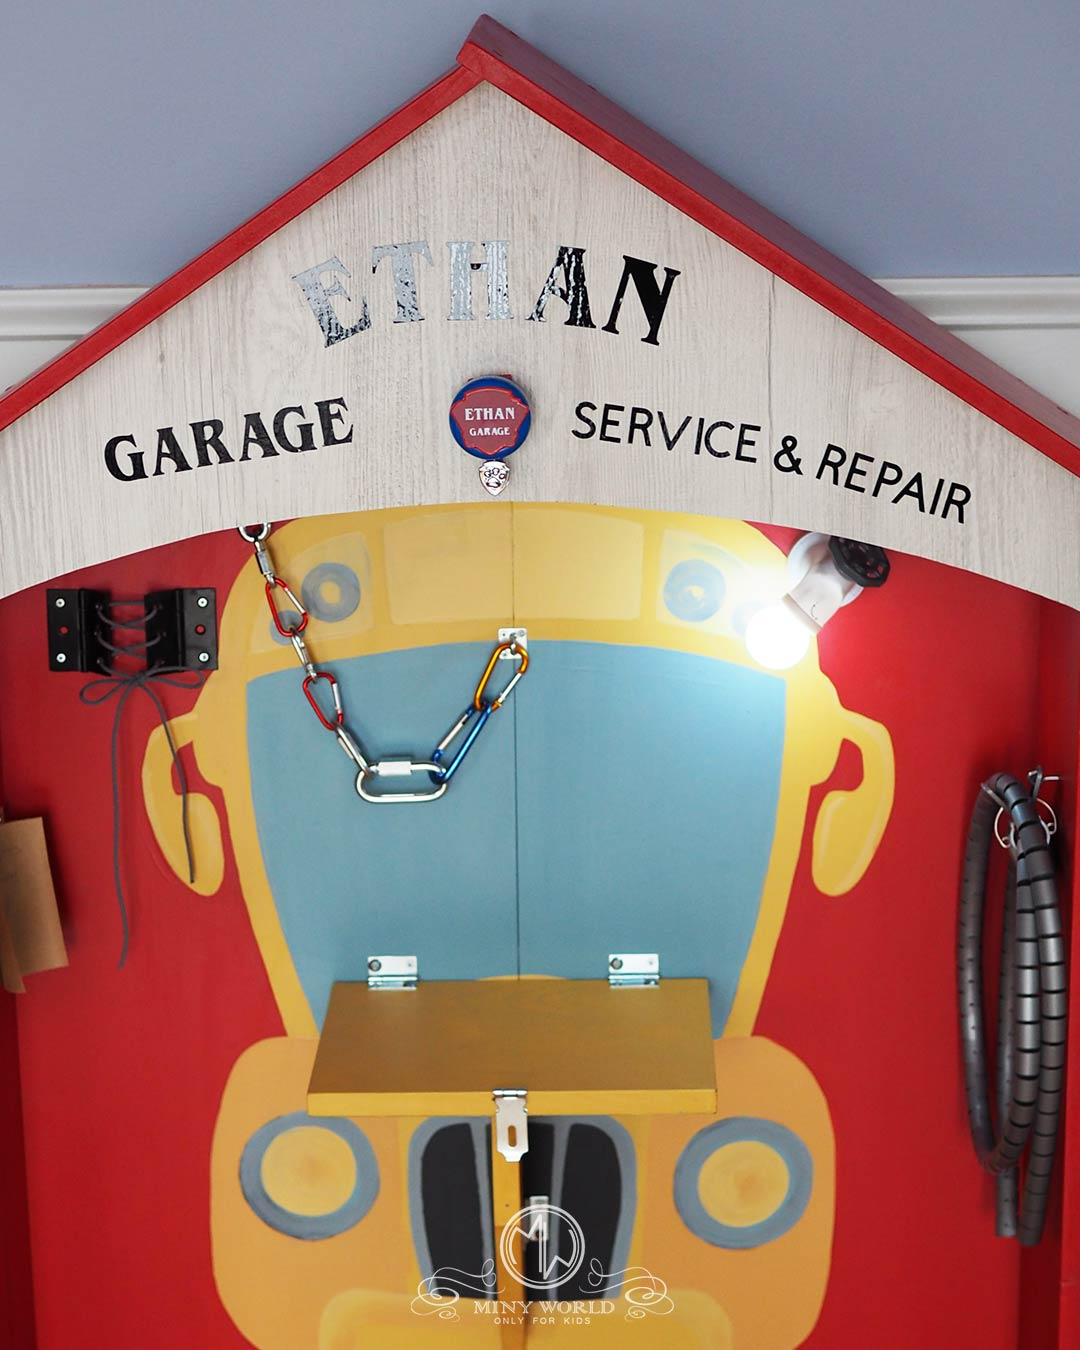 Ethan-Garage-play-house-8